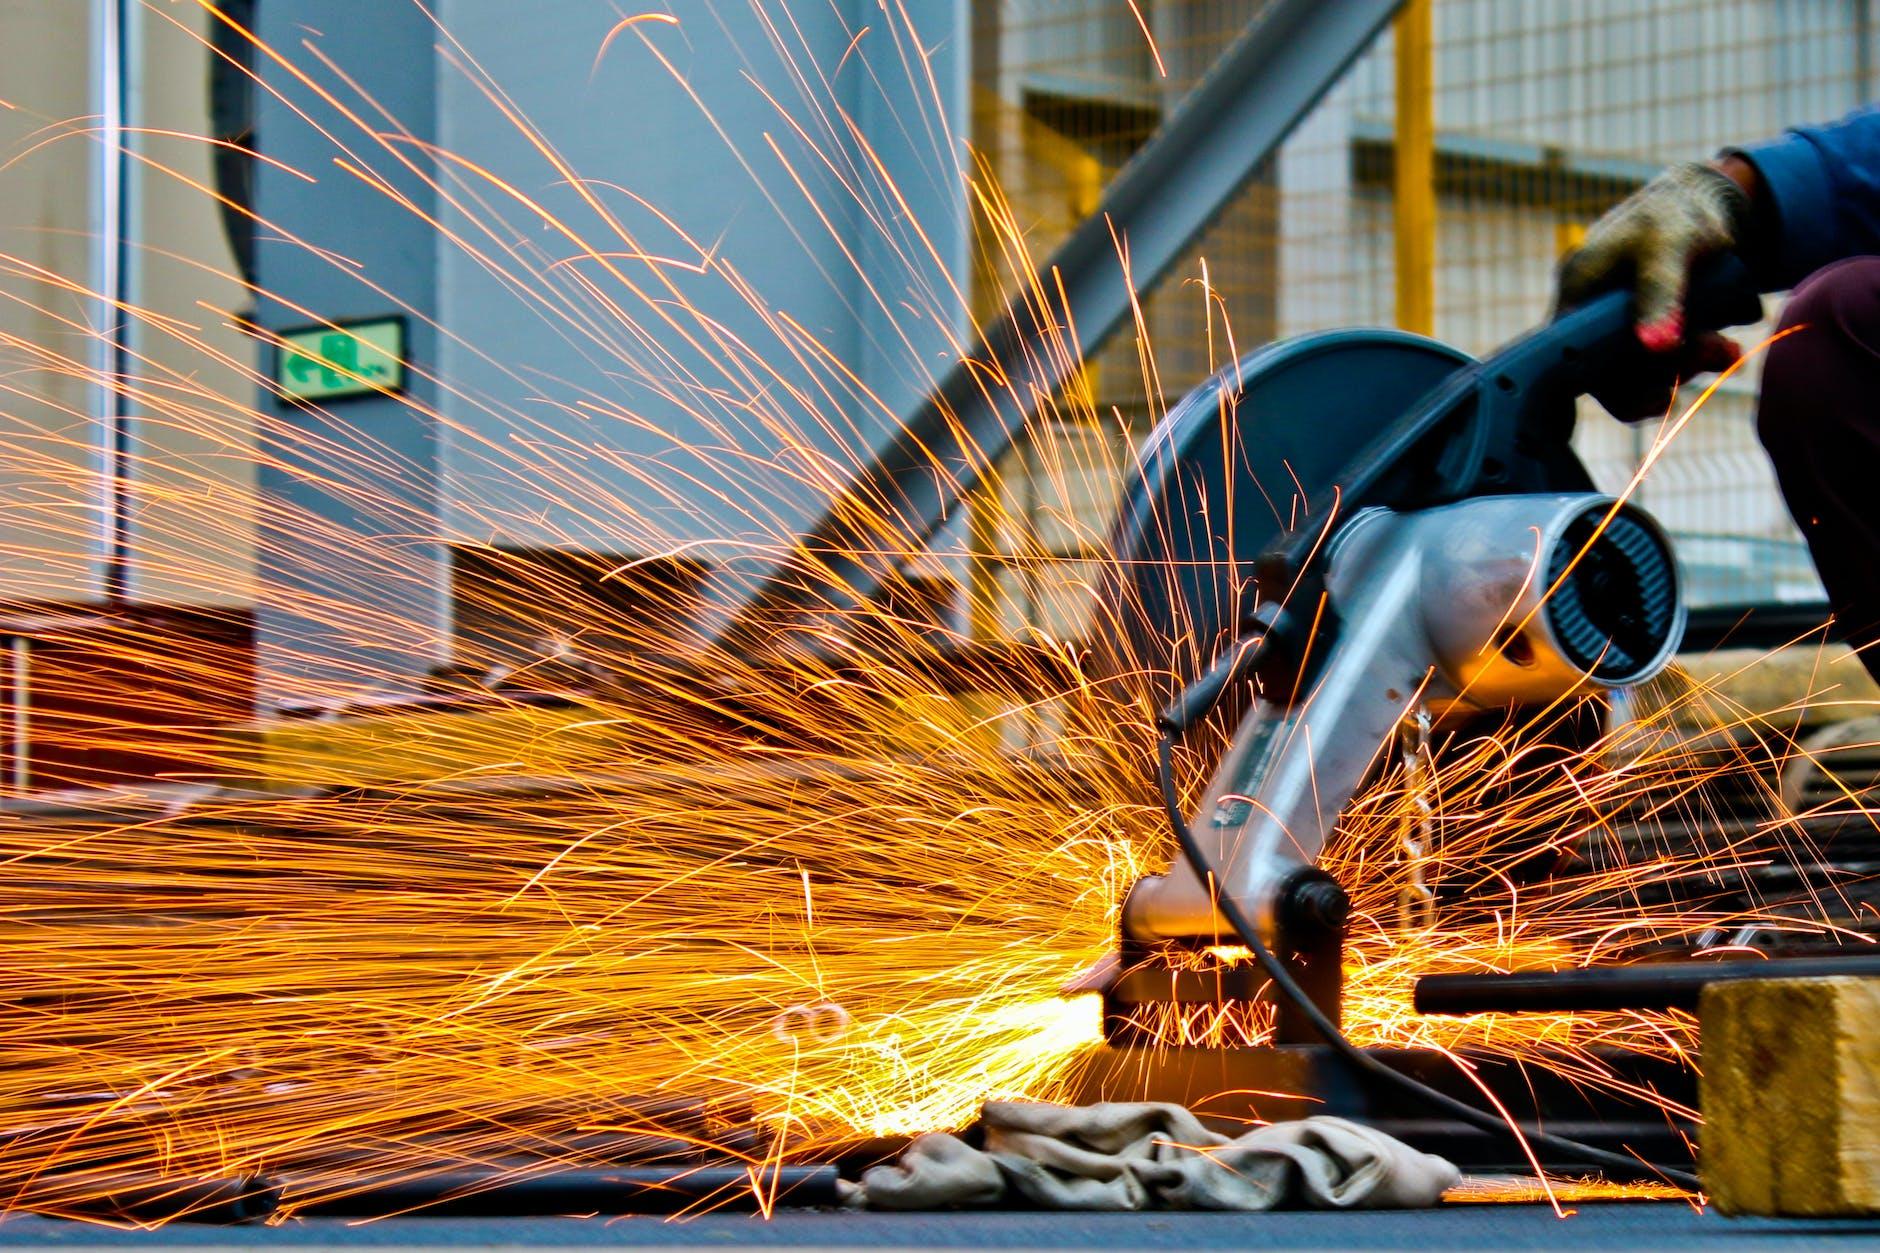 "<img src=""steel industry-1.jpg"" alt=""steel industry in india""/>"